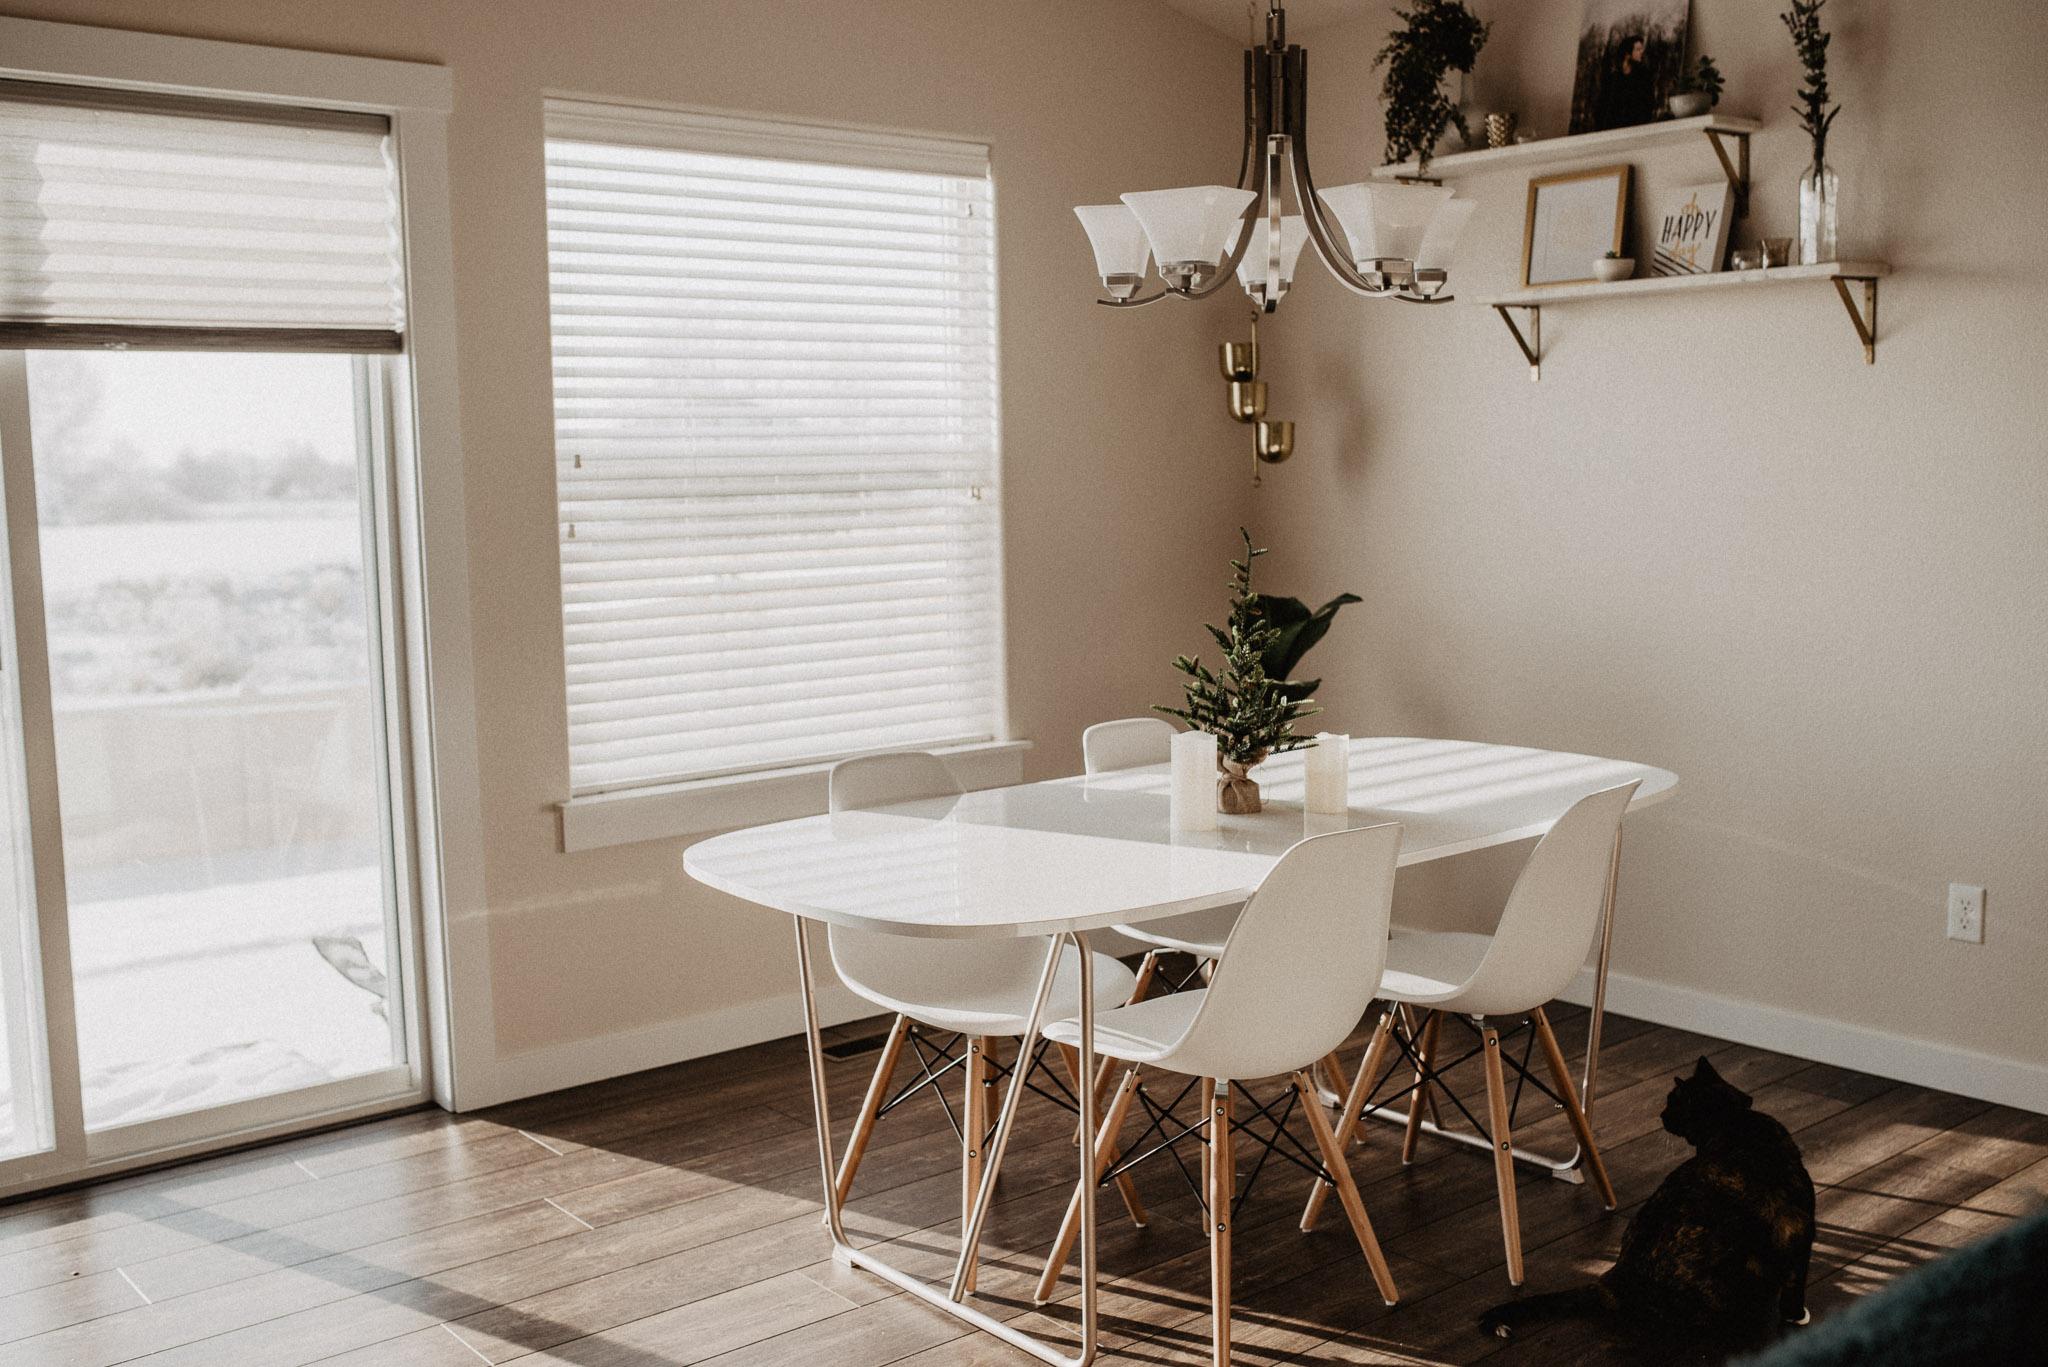 Boise Boudoir Photographer Boise Senior Photographer Makayla Madden Photography Mid Century Modern Kitchen Table Chairs Decor